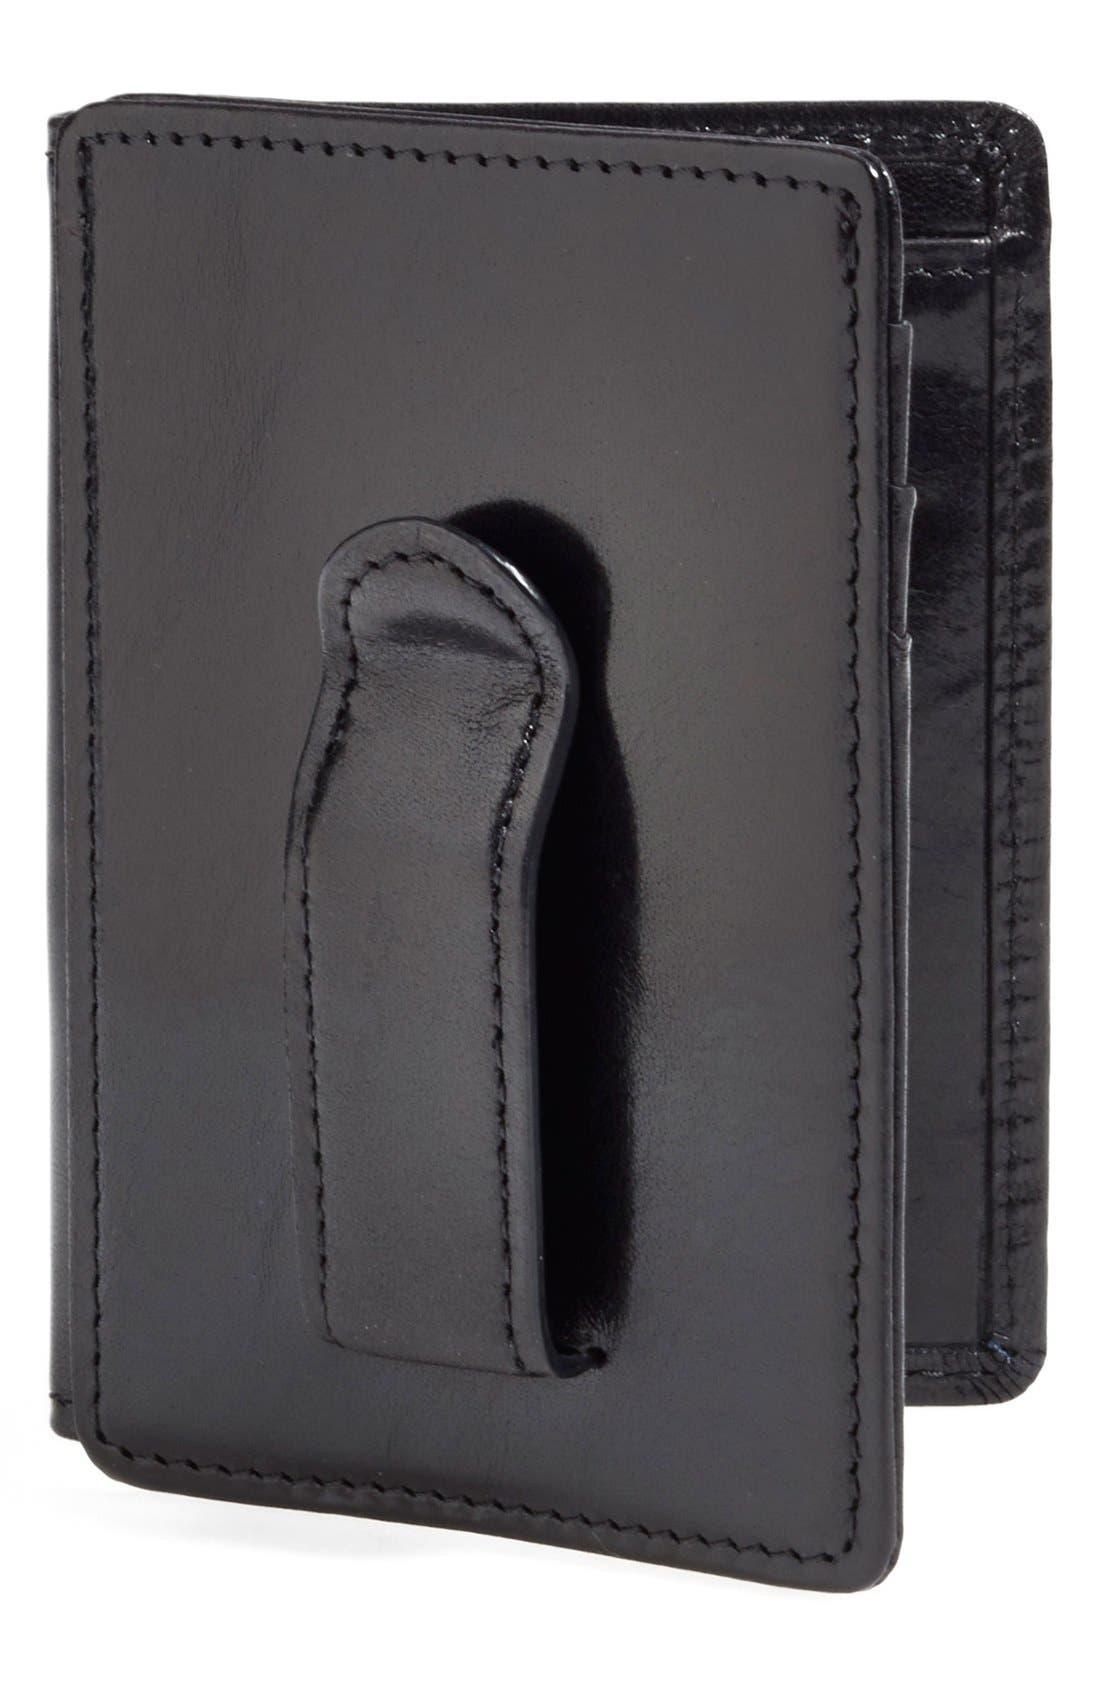 'Old Leather' Front Pocket ID Wallet,                         Main,                         color, Black